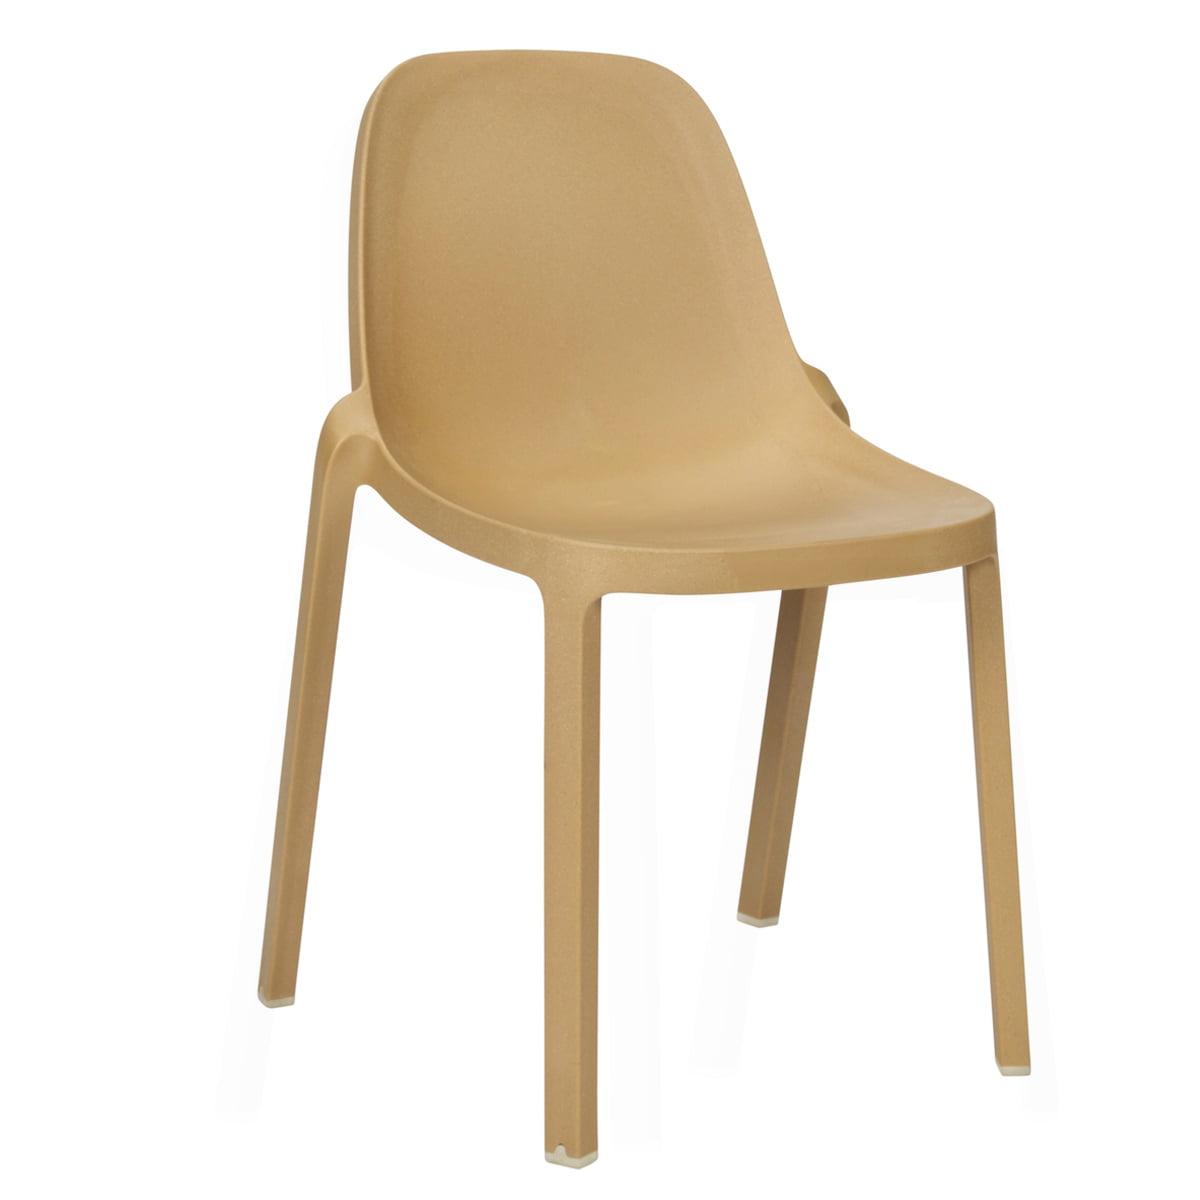 Emeco   Broom Chair, Natural